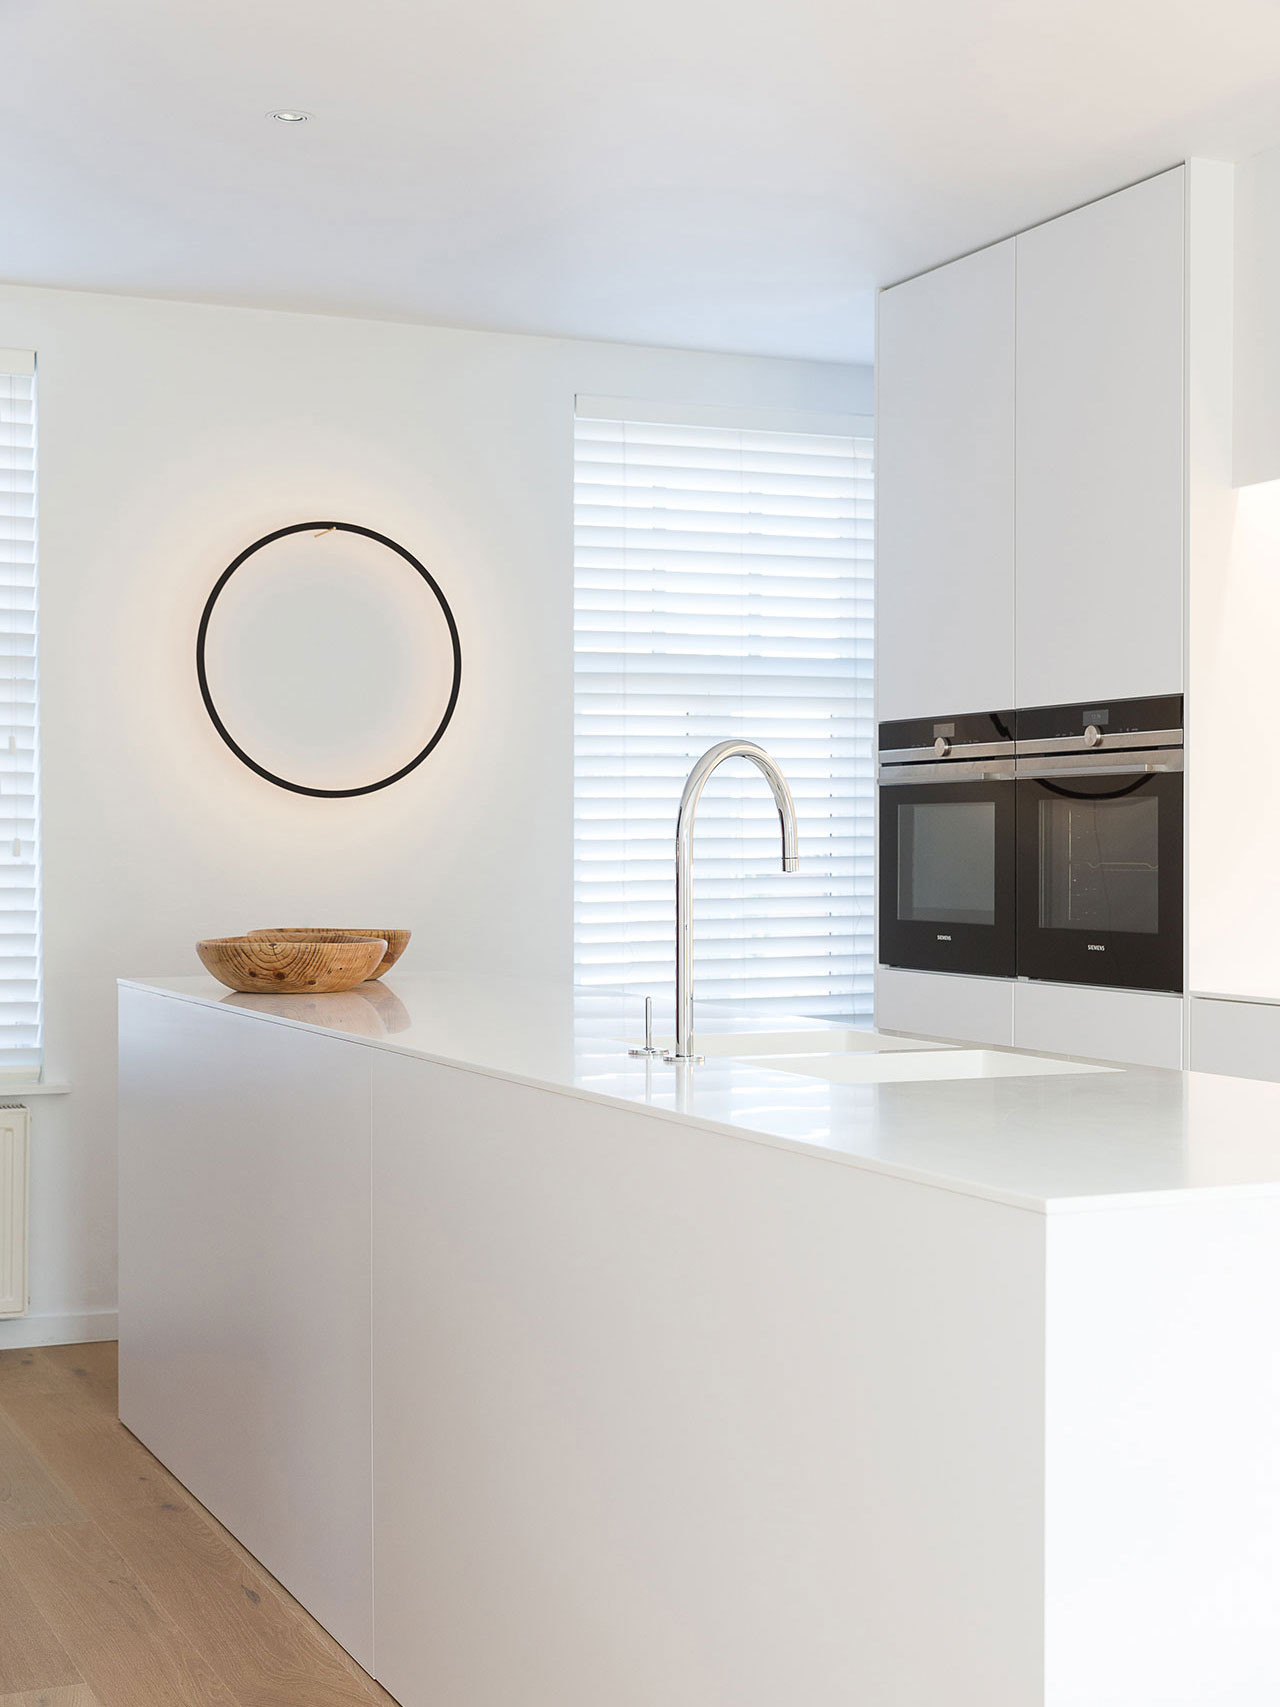 Dekeyzer-hedendaagse-keuken-satijnlak-wit-corian-1.jpg